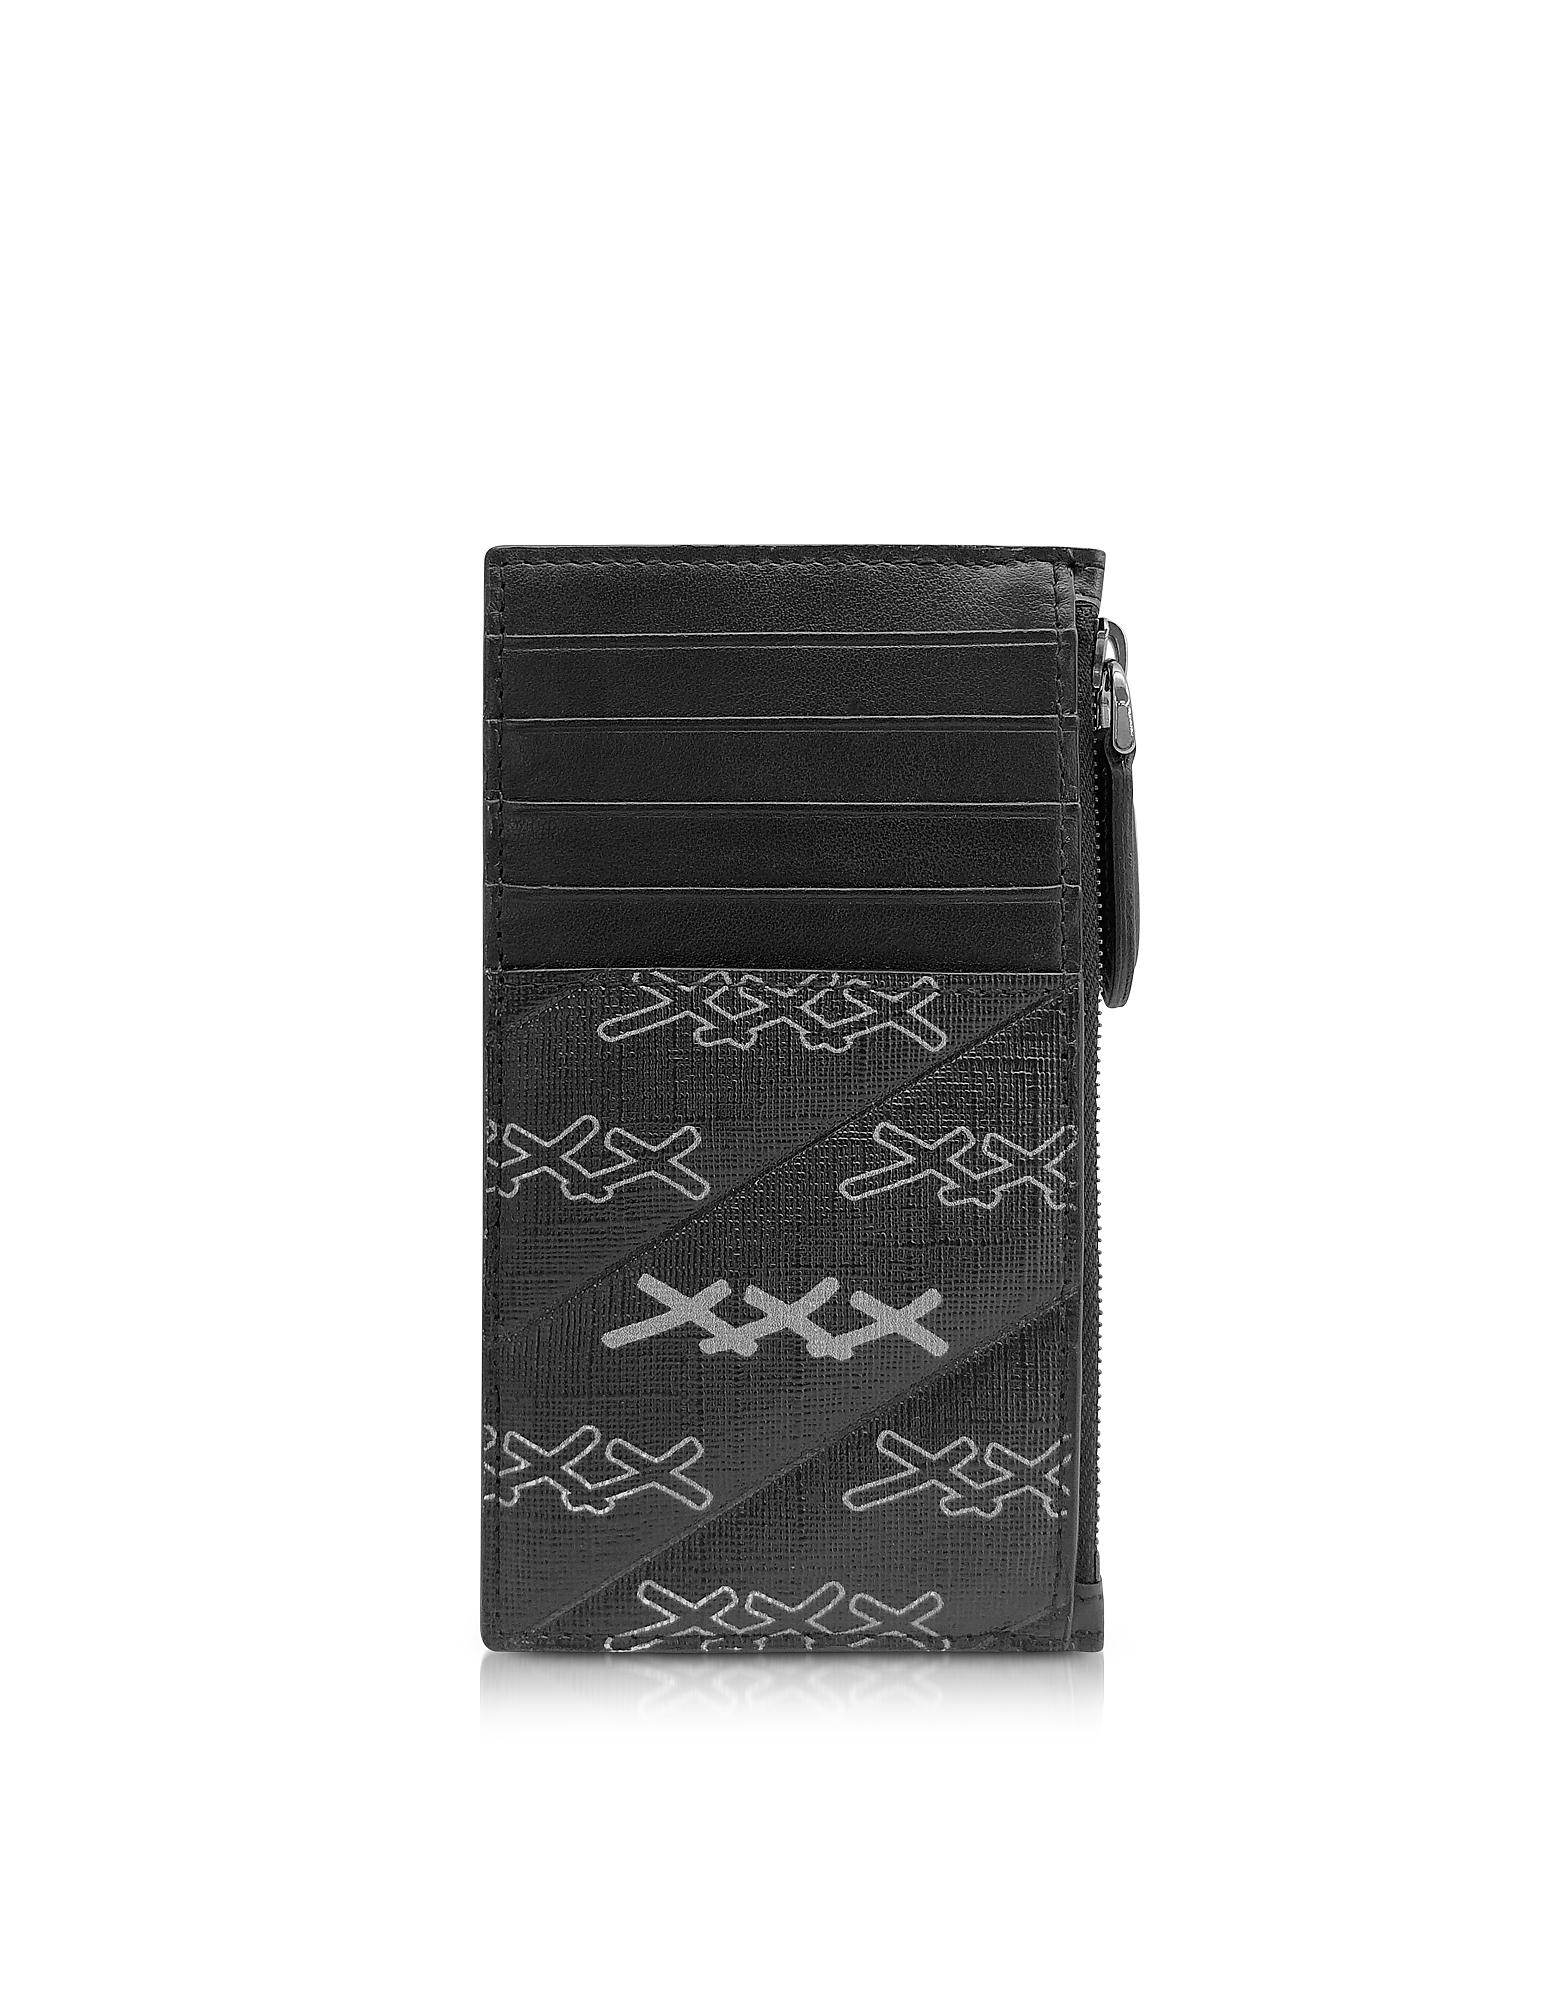 Black Coated Canvas Signature Vertical Card Holder